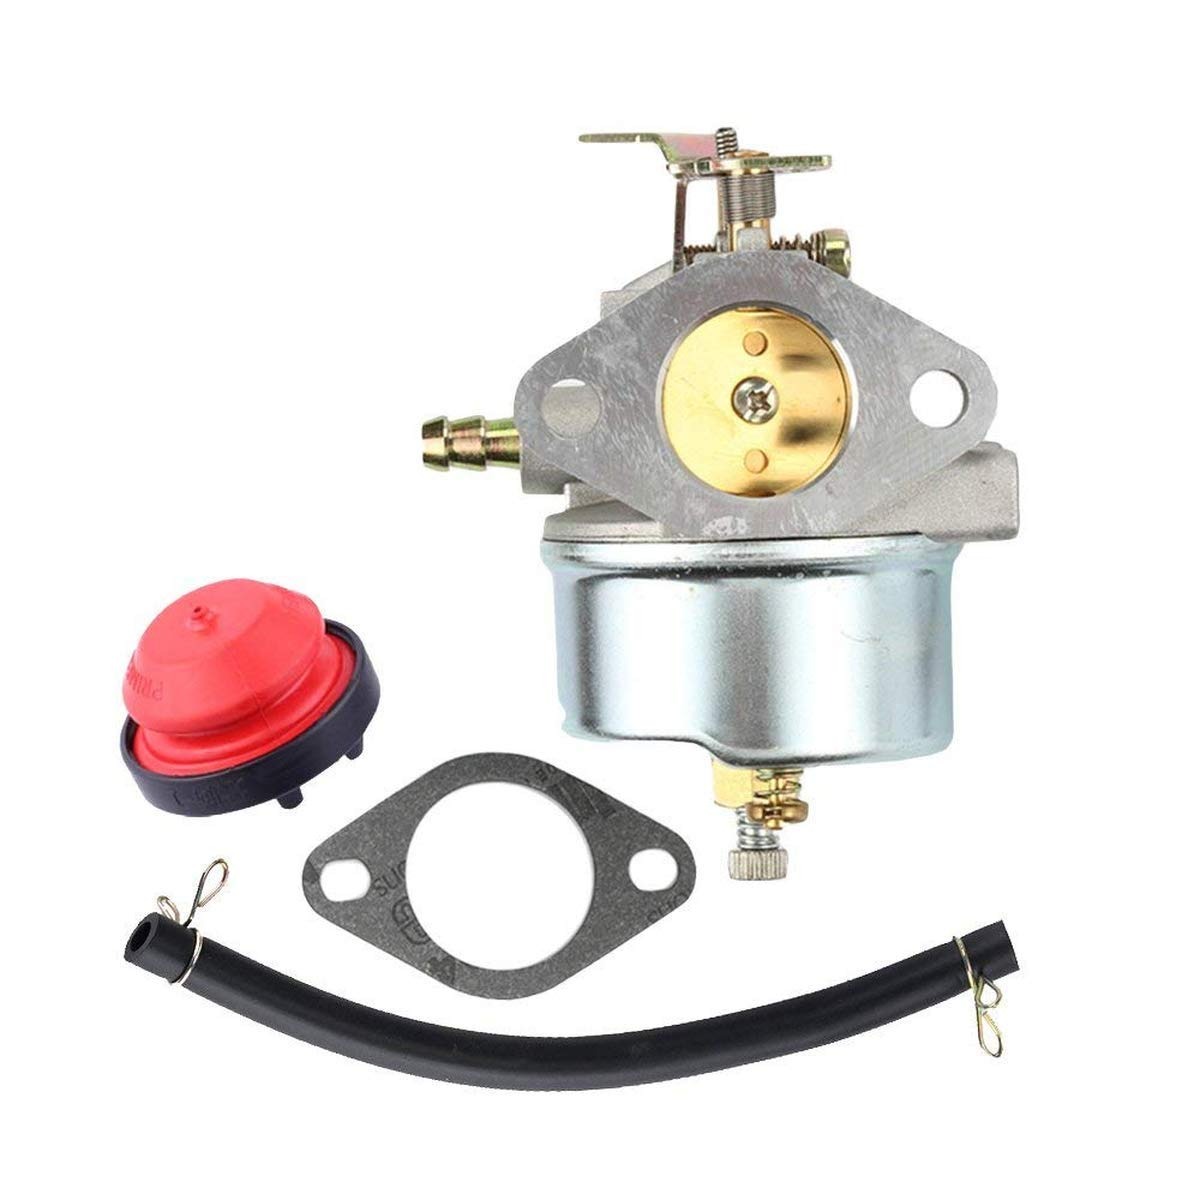 xiscose Carburetor 632370A with Gasket Fuel Pump Line Clamps for Tecumseh HM100 HMSK90 HMSK100 Cub Cadet Craftsman Toro 38555 38556 7HP 8HP Carb Snow Blower 632370 632110 china